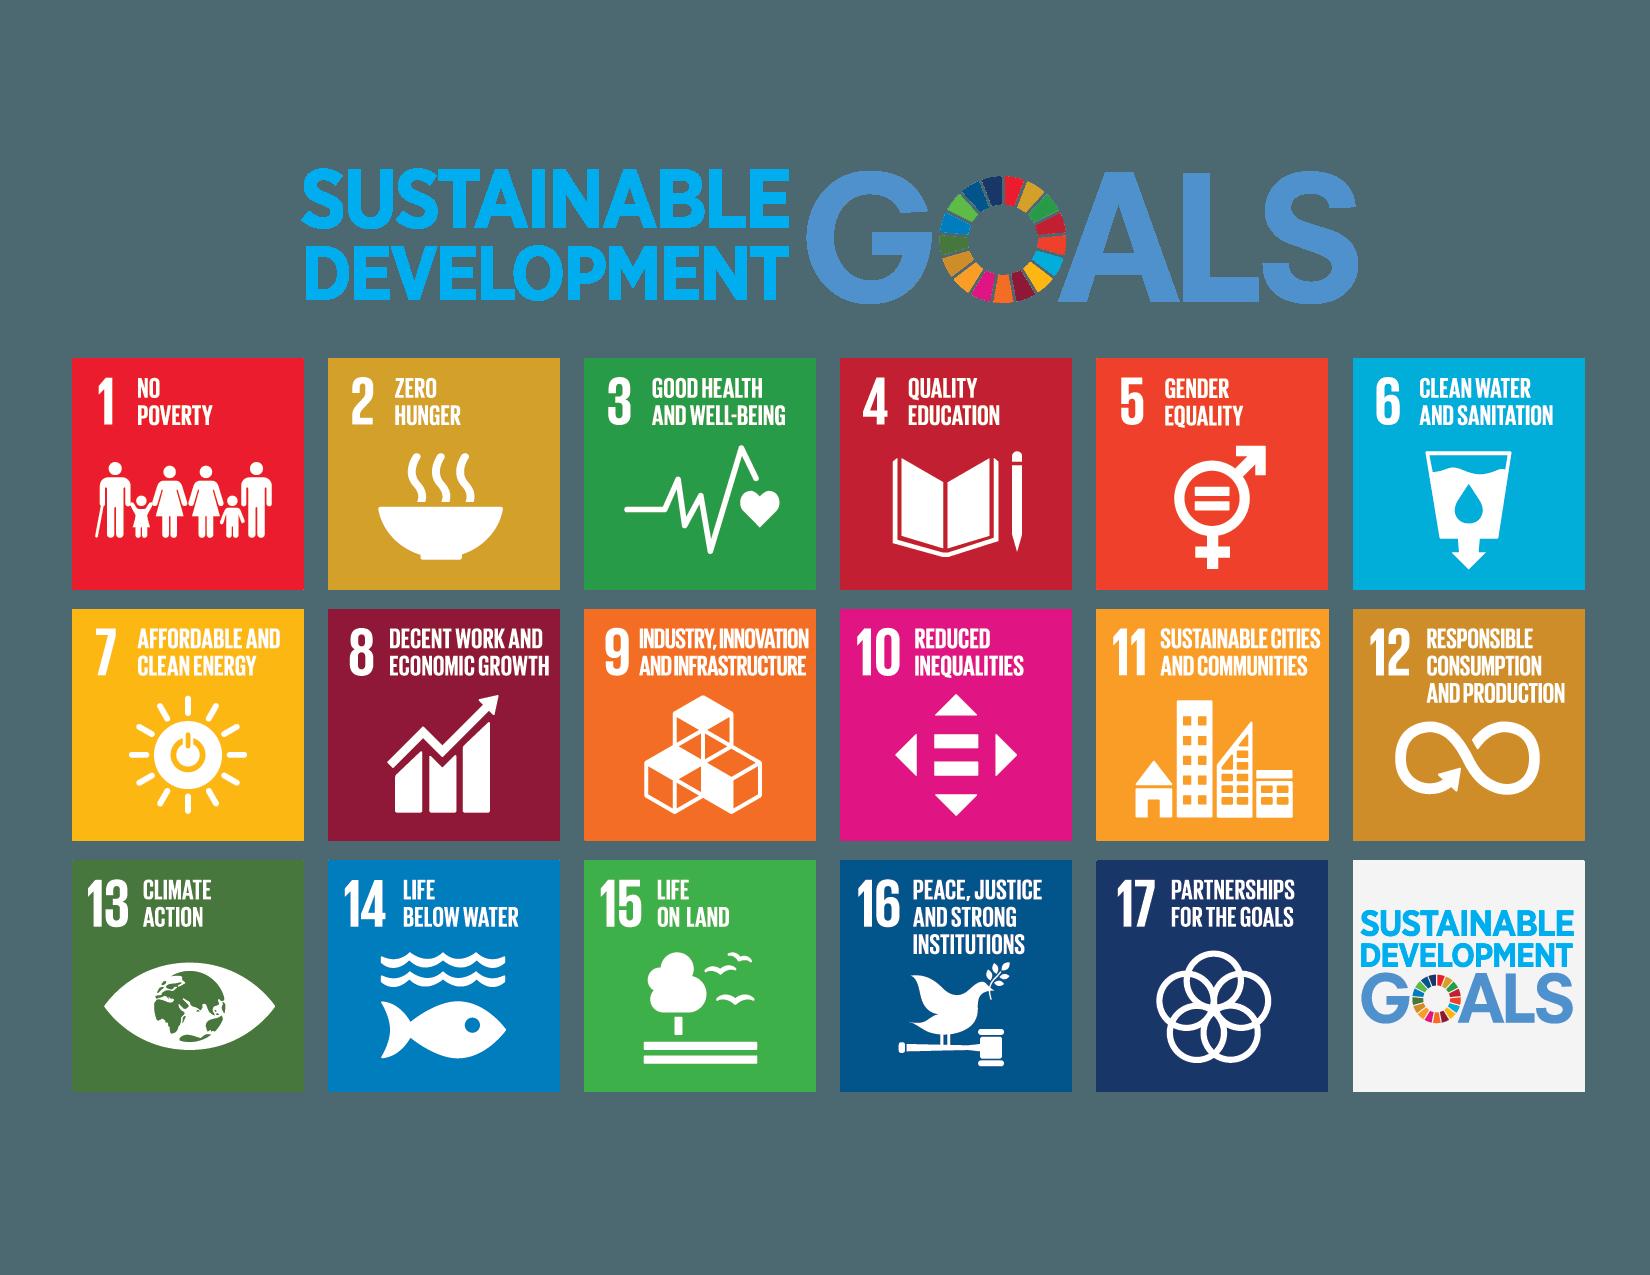 desarrollo, sostenible, sustainable, development